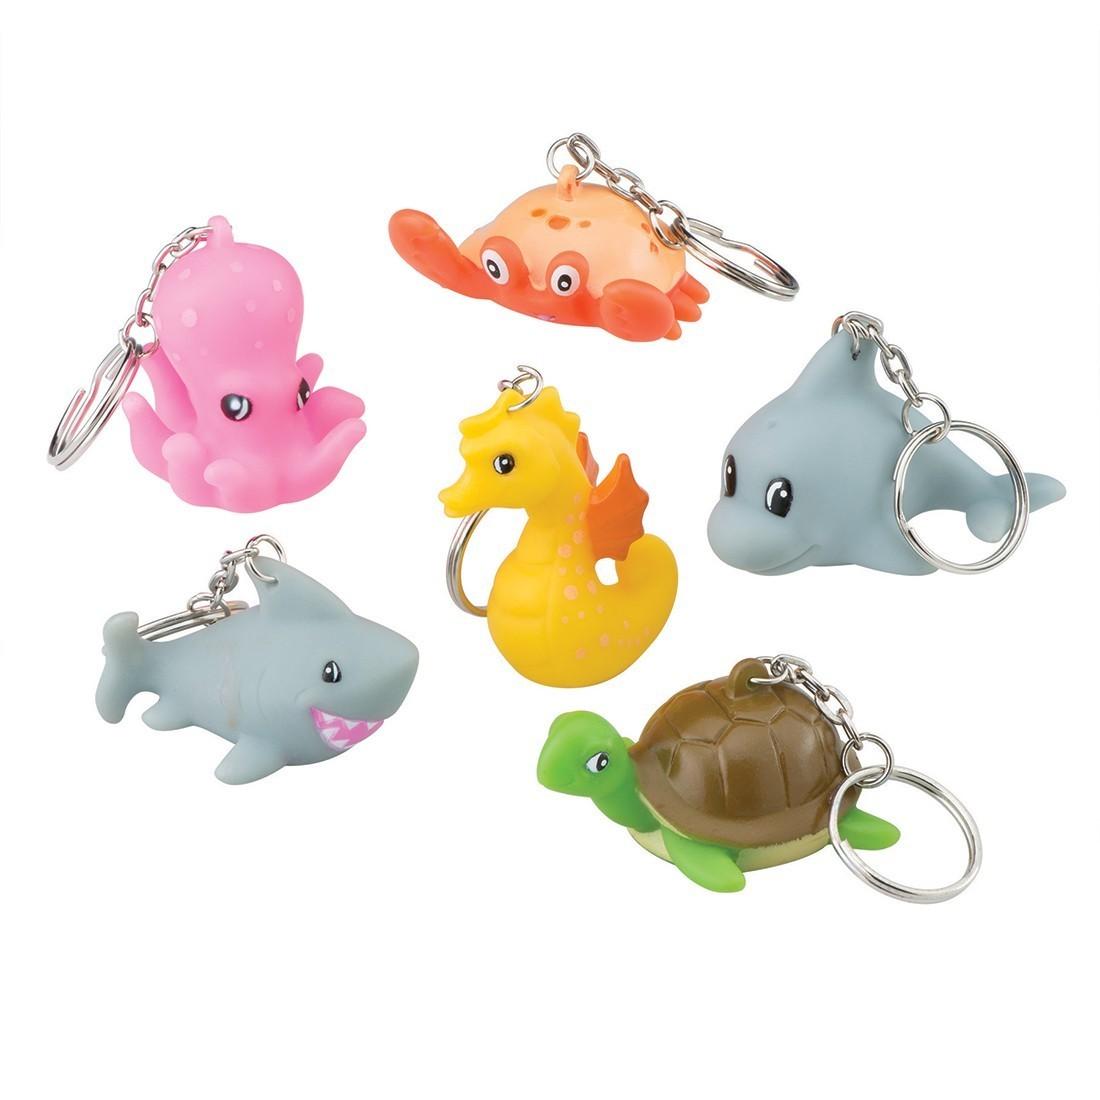 Sea Life Pals Backpack Pulls [image]